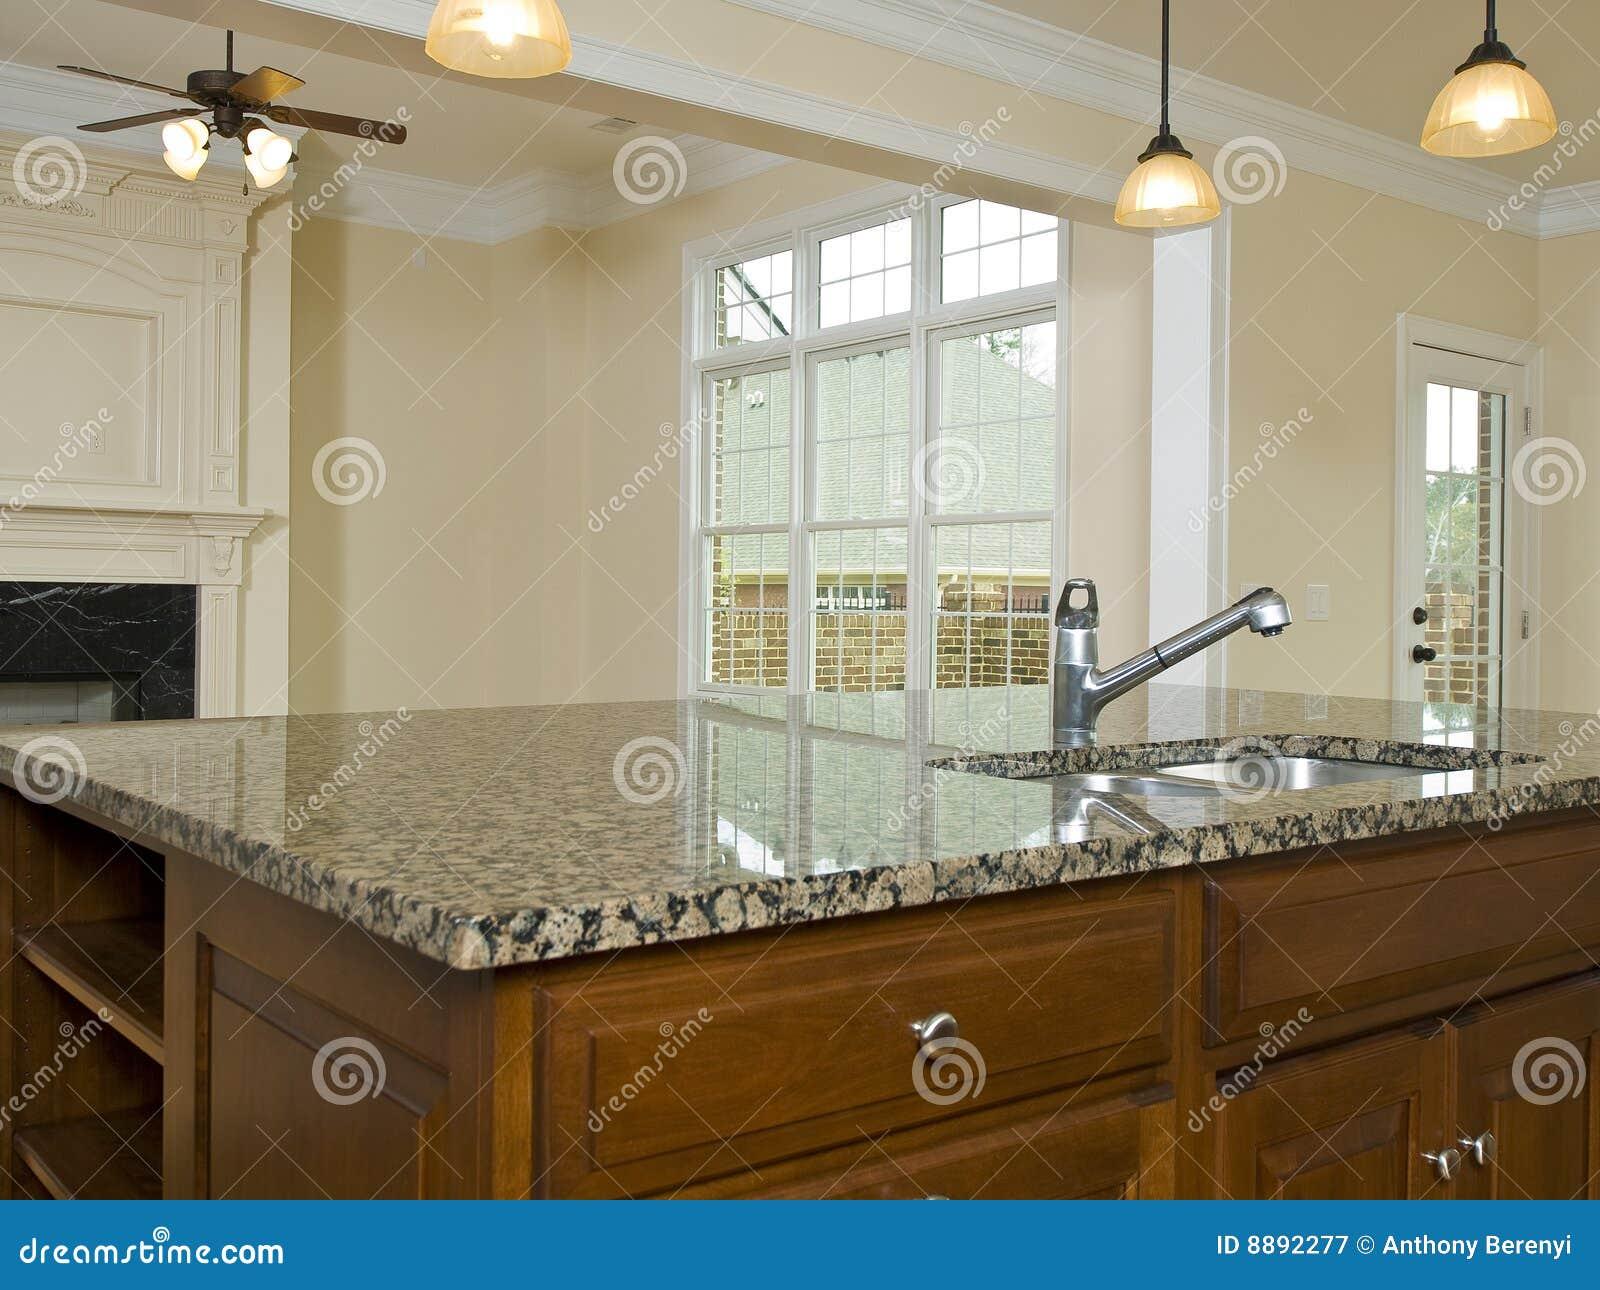 Luxury home kitchen granite island countertop royalty free stock photography image 8892277 - Modern luxury kitchen with granite countertop ...